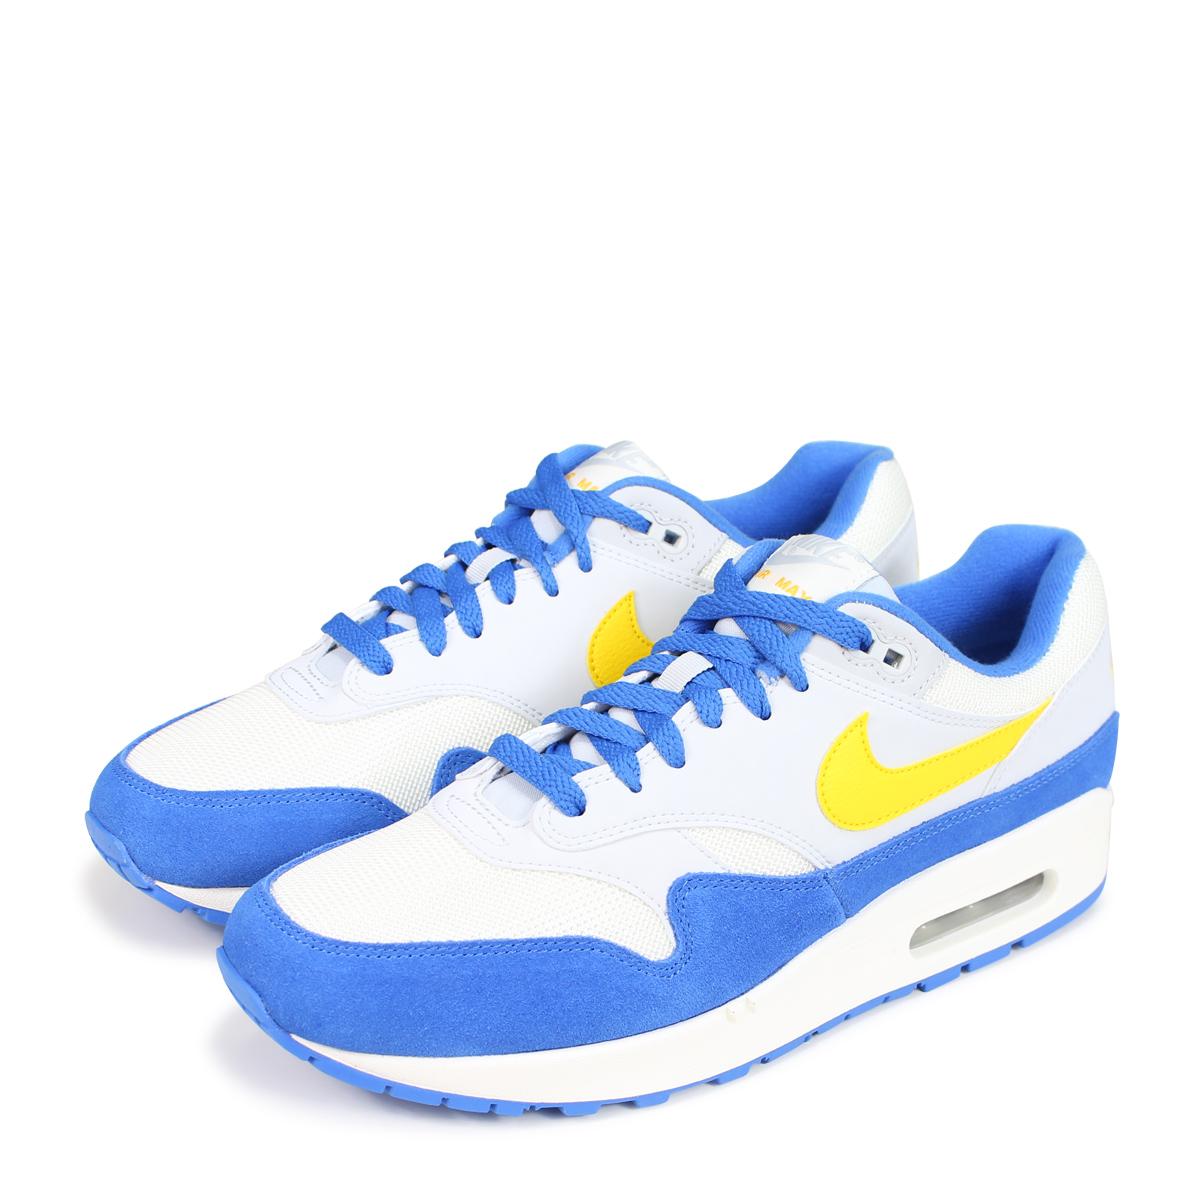 ALLSPORTS: NIKE AIR MAX 1 Kie Ney AMAX 1 sneakers men AH8145